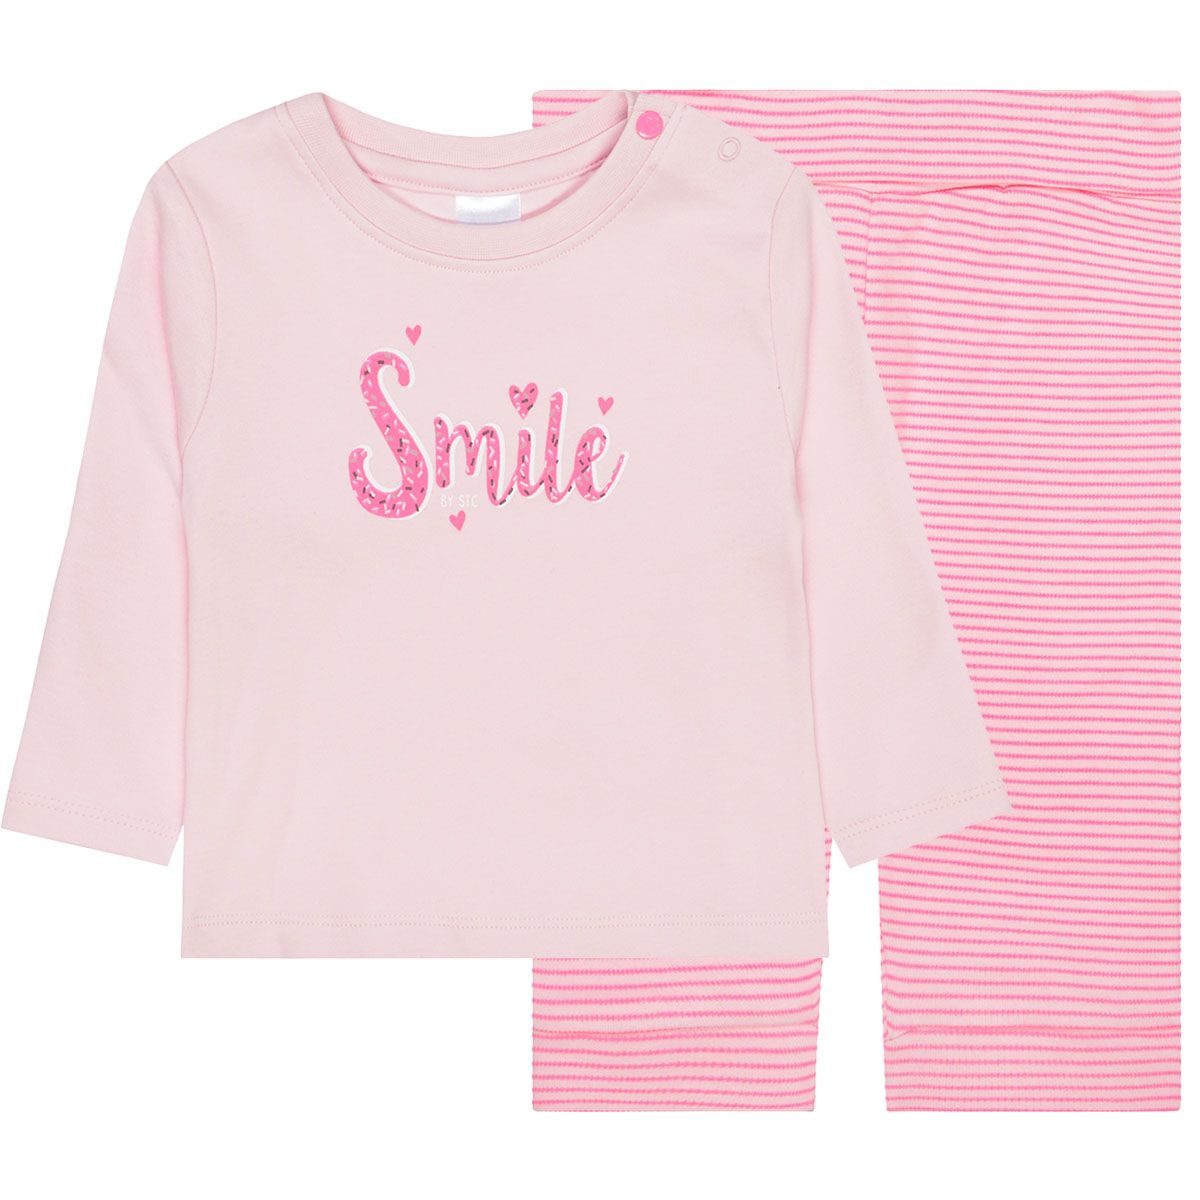 Pyjama Smile Organic Cotton - Rose Melange Stripes